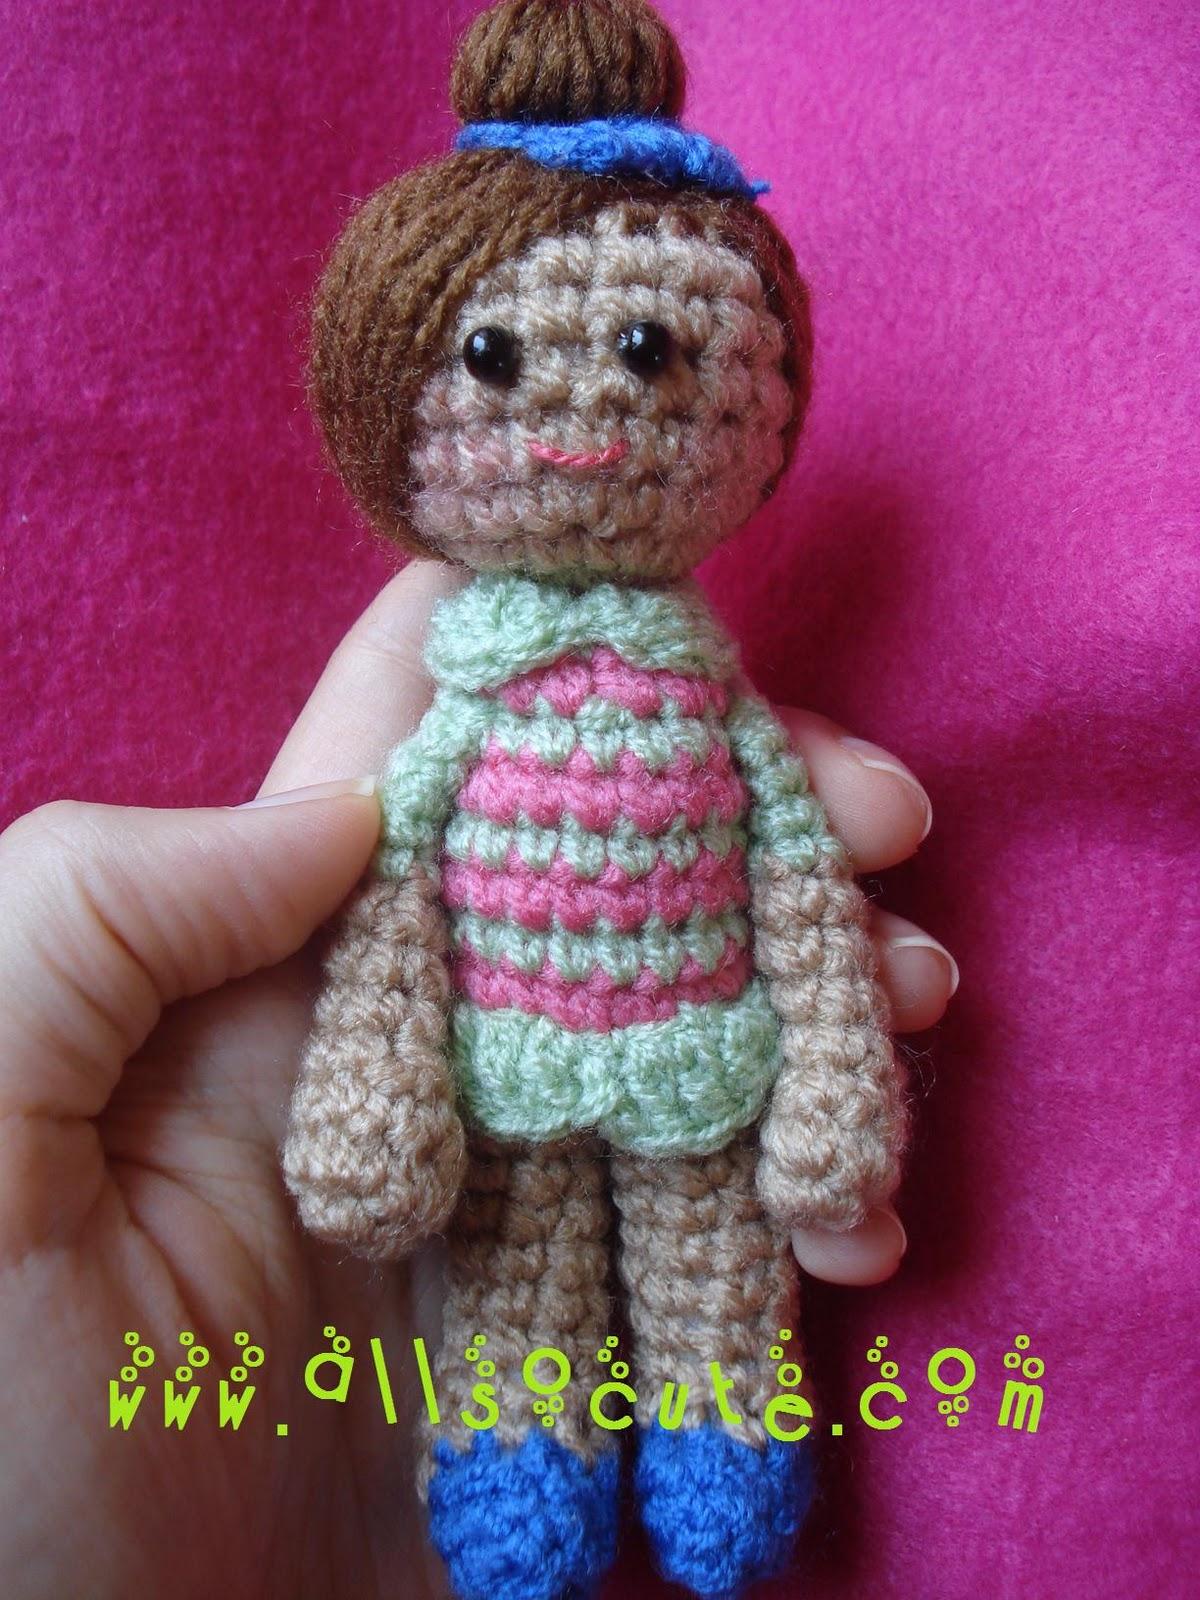 AllSoCute Amigurumis: Lily a Gorgeous Amigurumi Doll ...